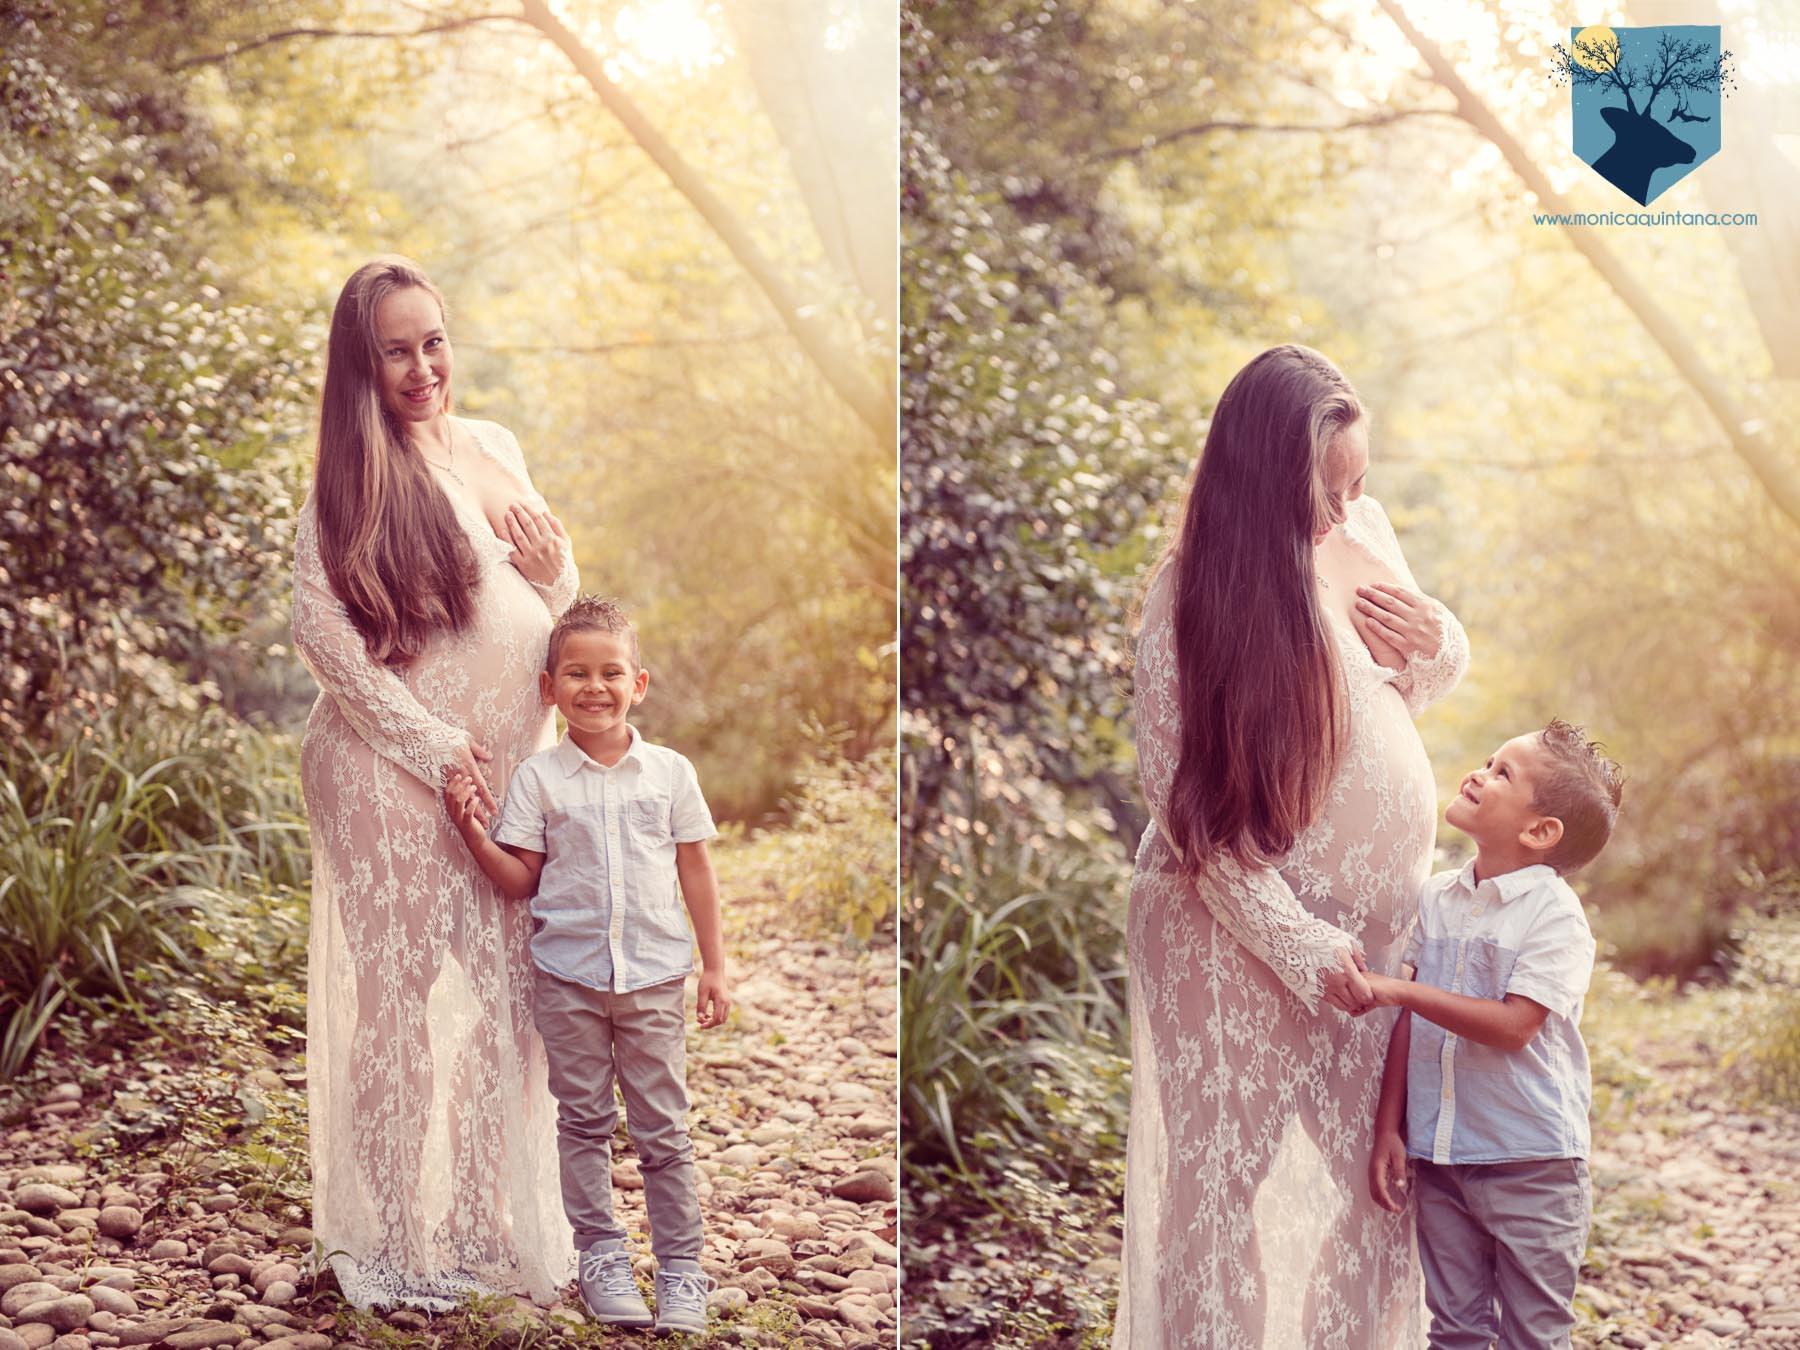 fotografia fotos girona figueres emporda monica quintana familia retrato embarazo hermanos